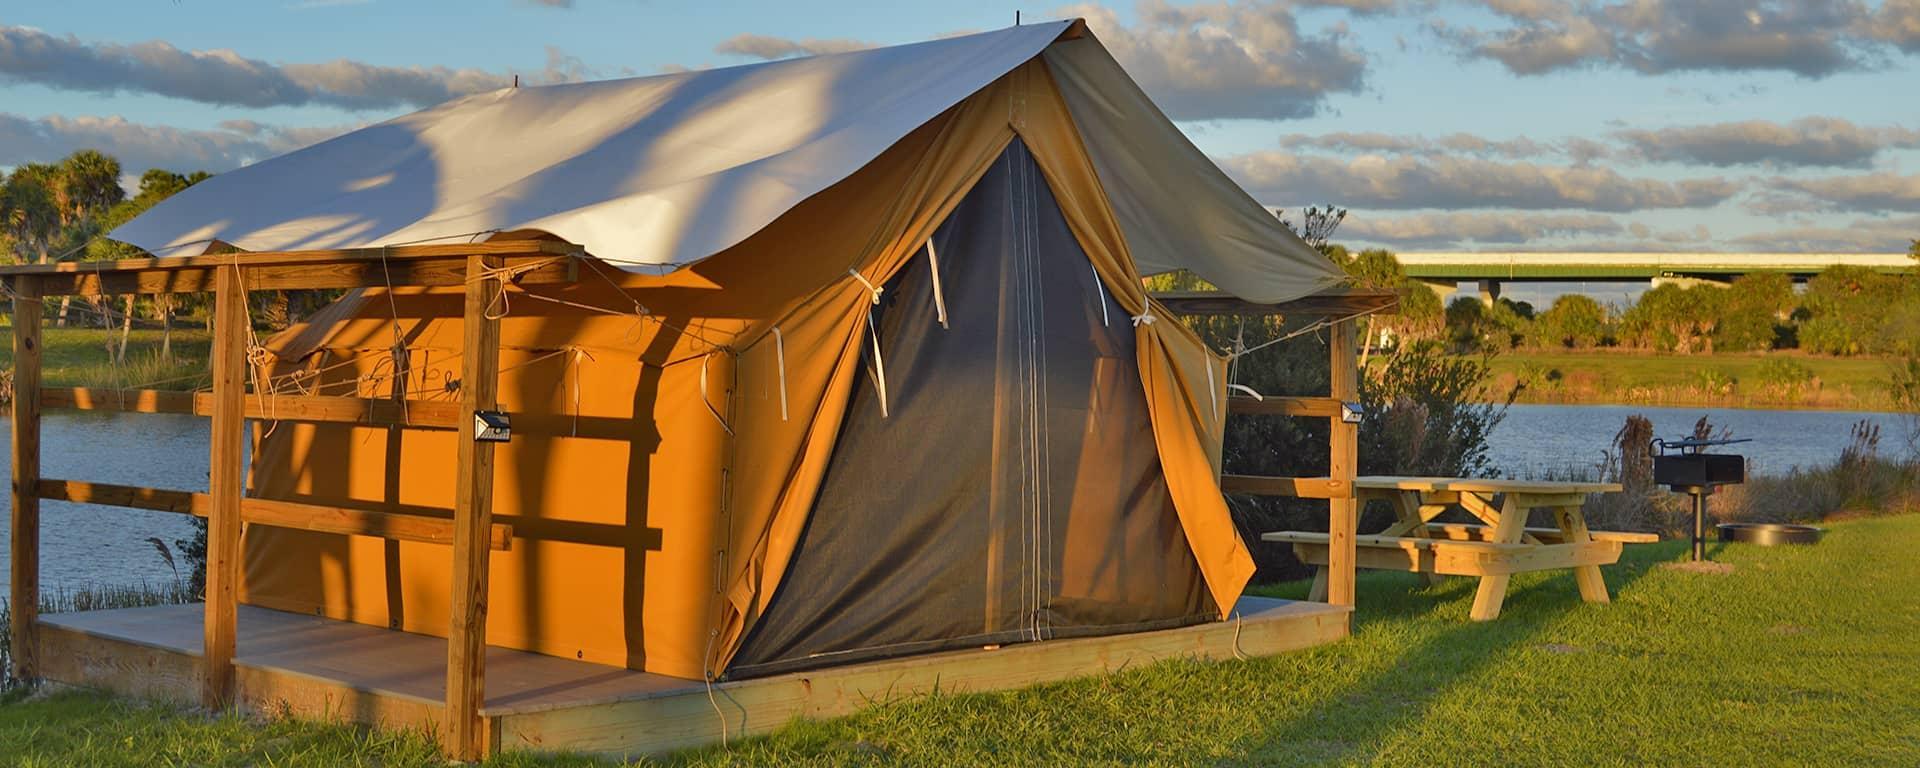 Phipps Park Adventure Tent